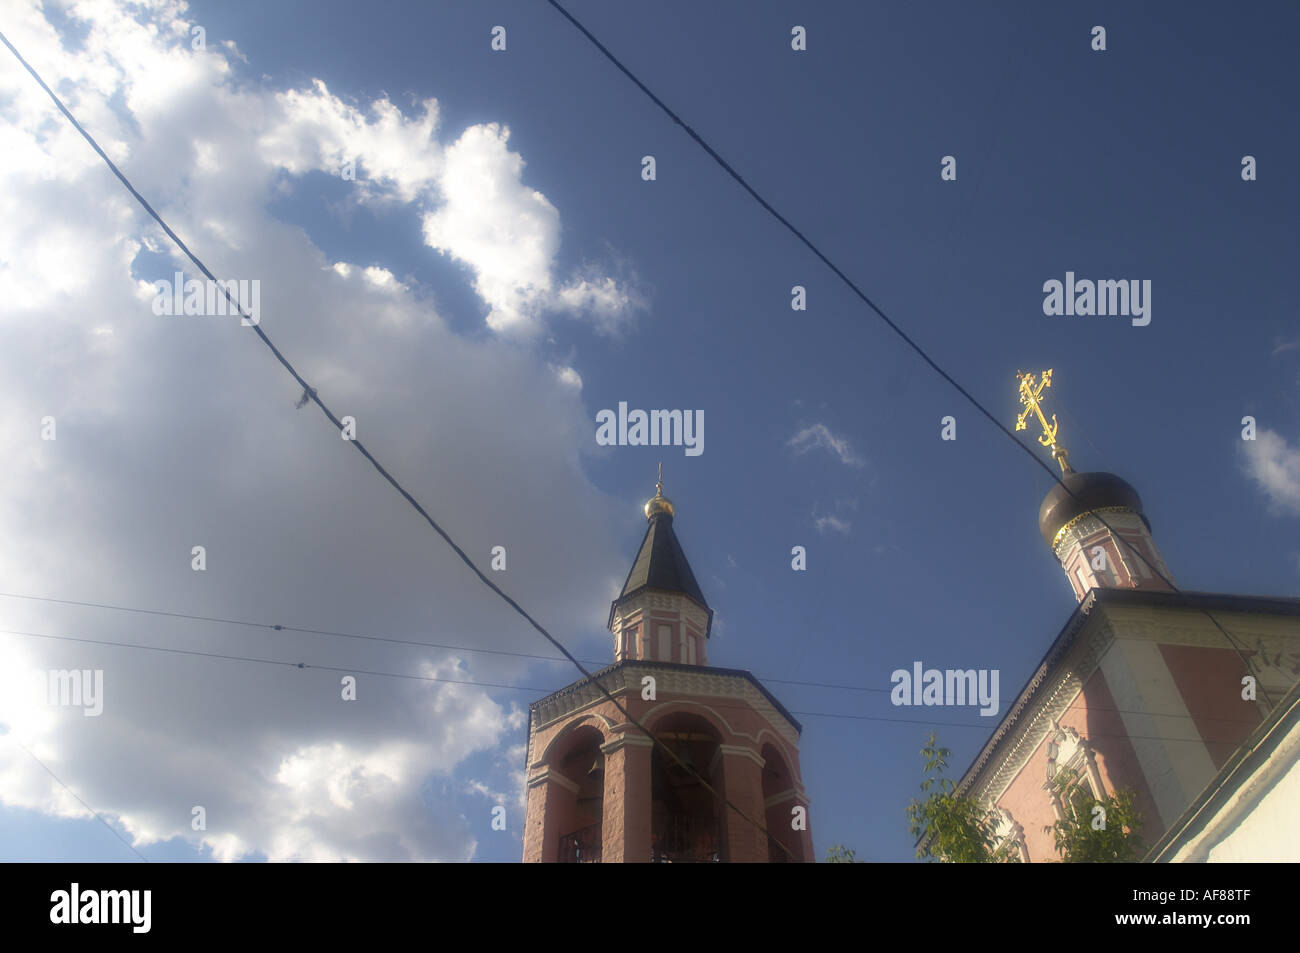 City church - Stock Image